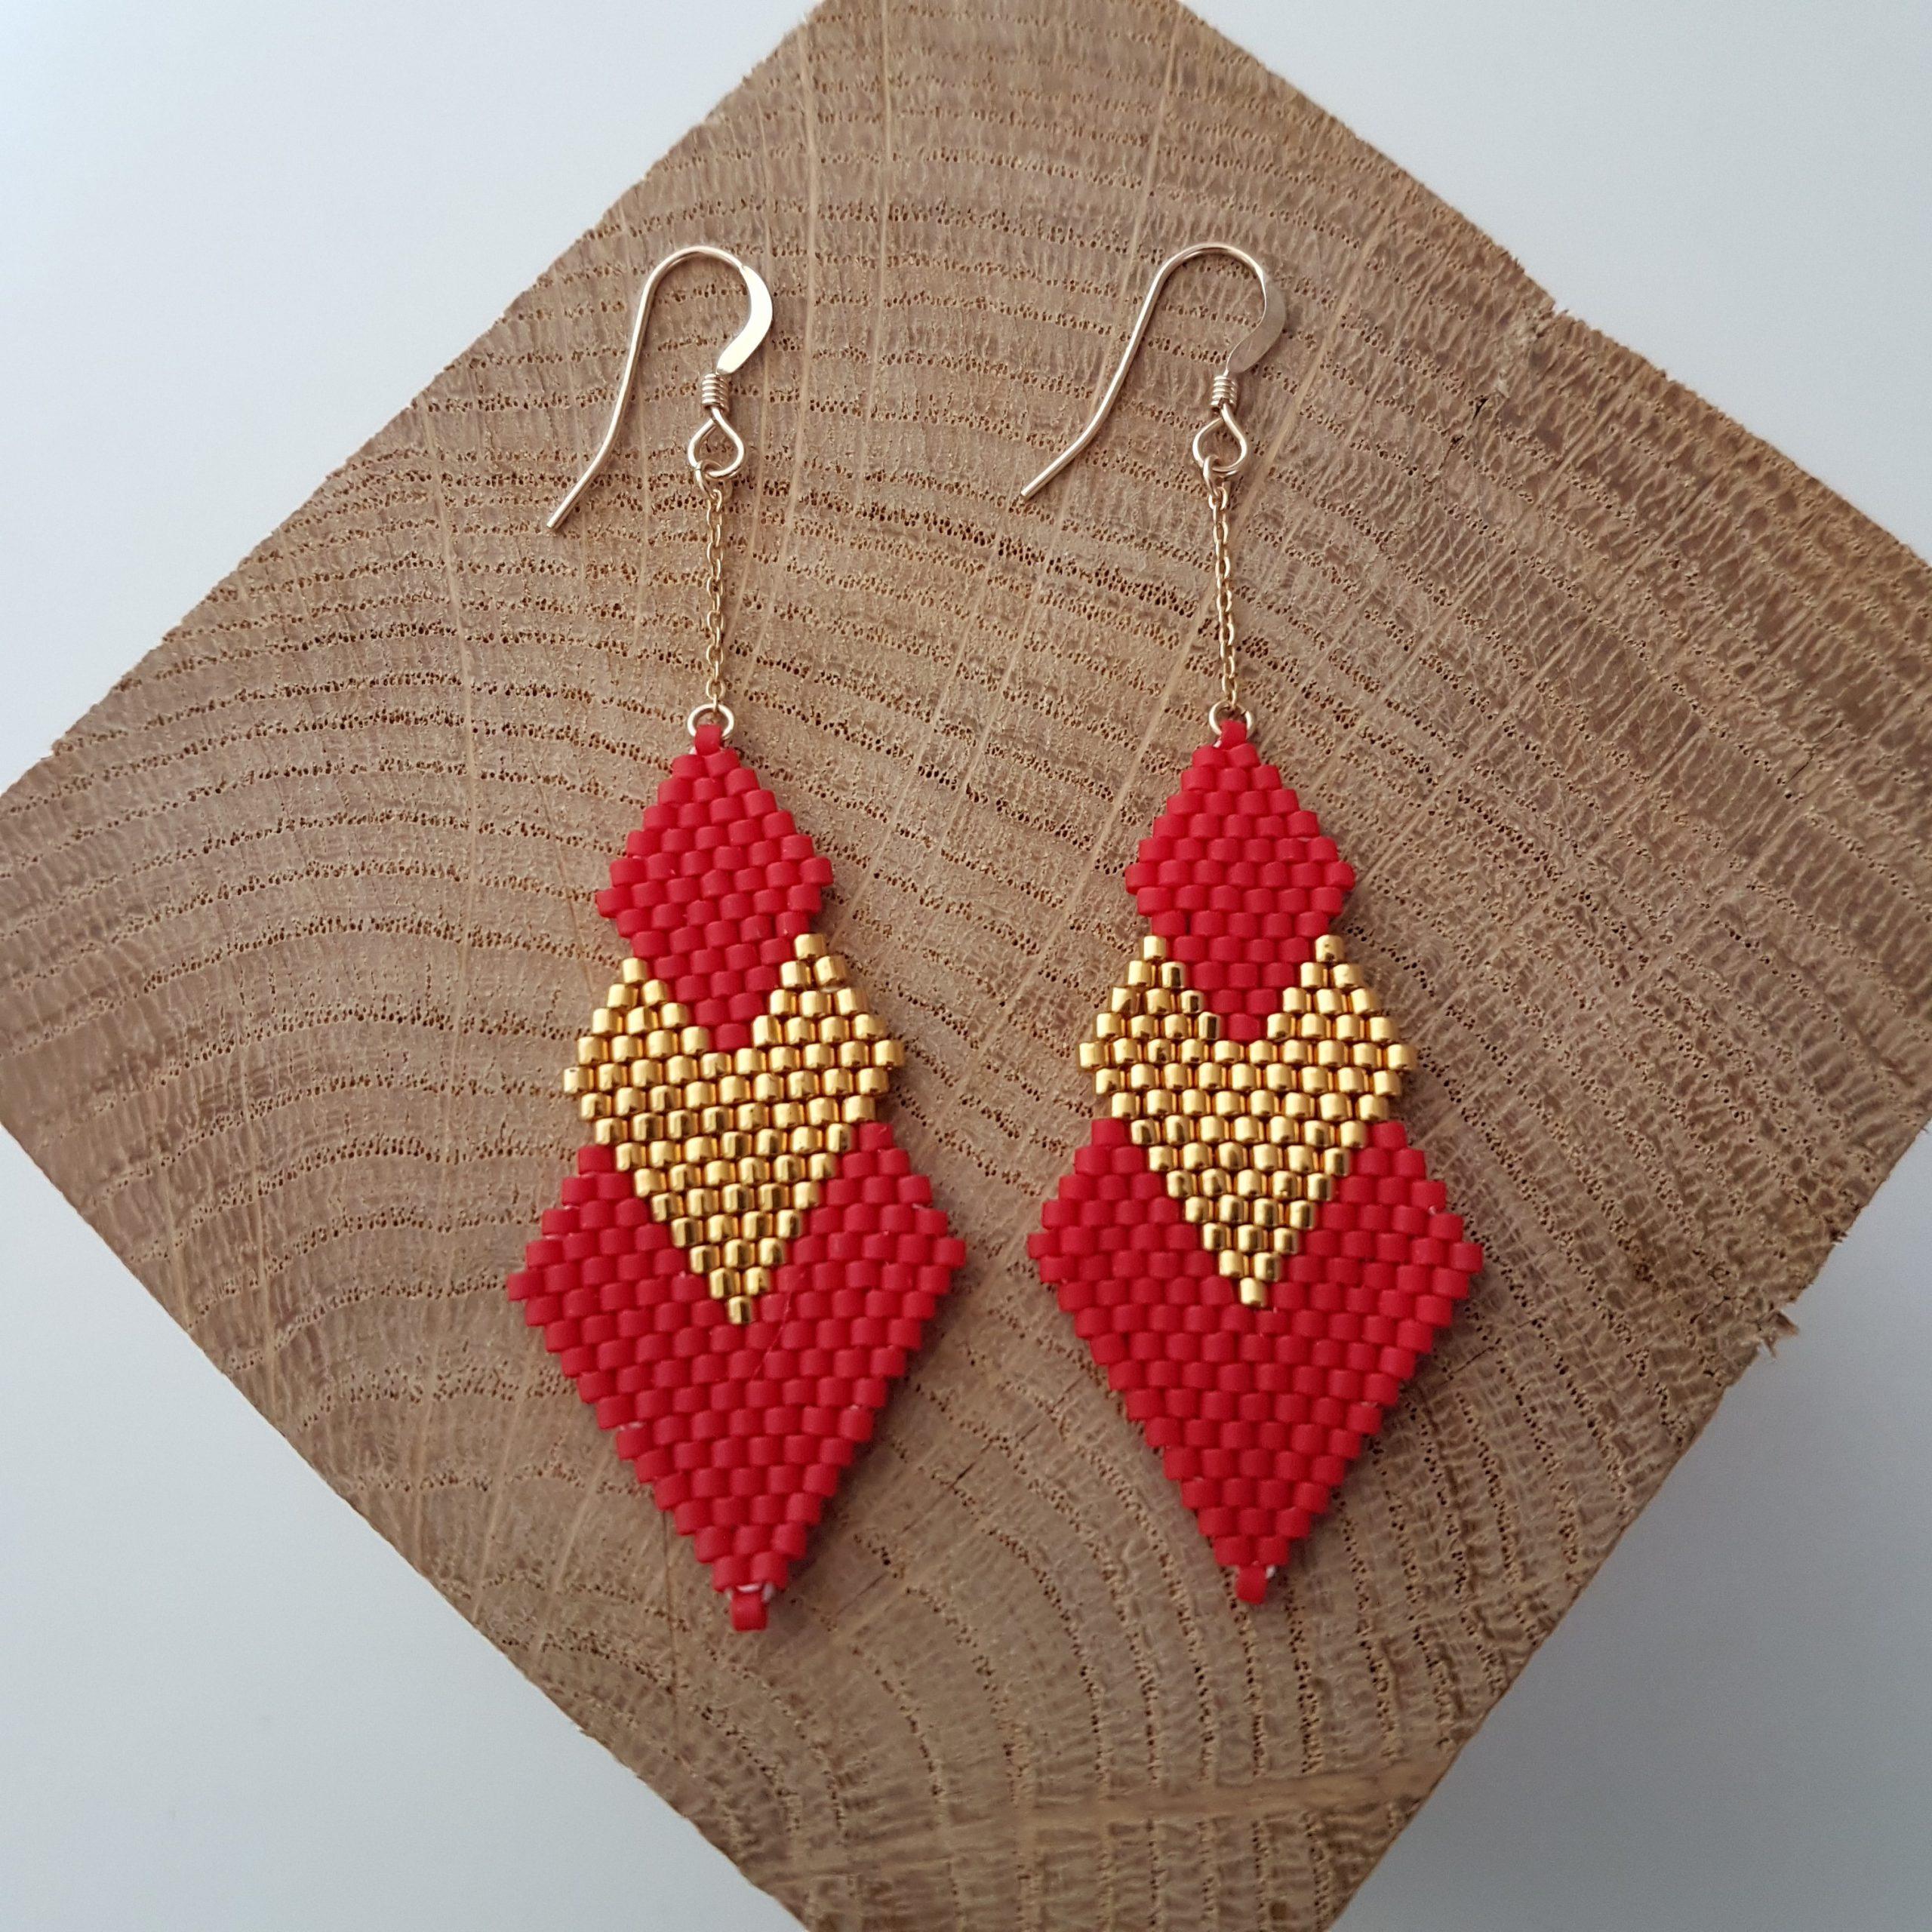 Cadeau Bijou artisanal lyon Boucles d'oreilles Pénélope rouge plaqué or miyuki